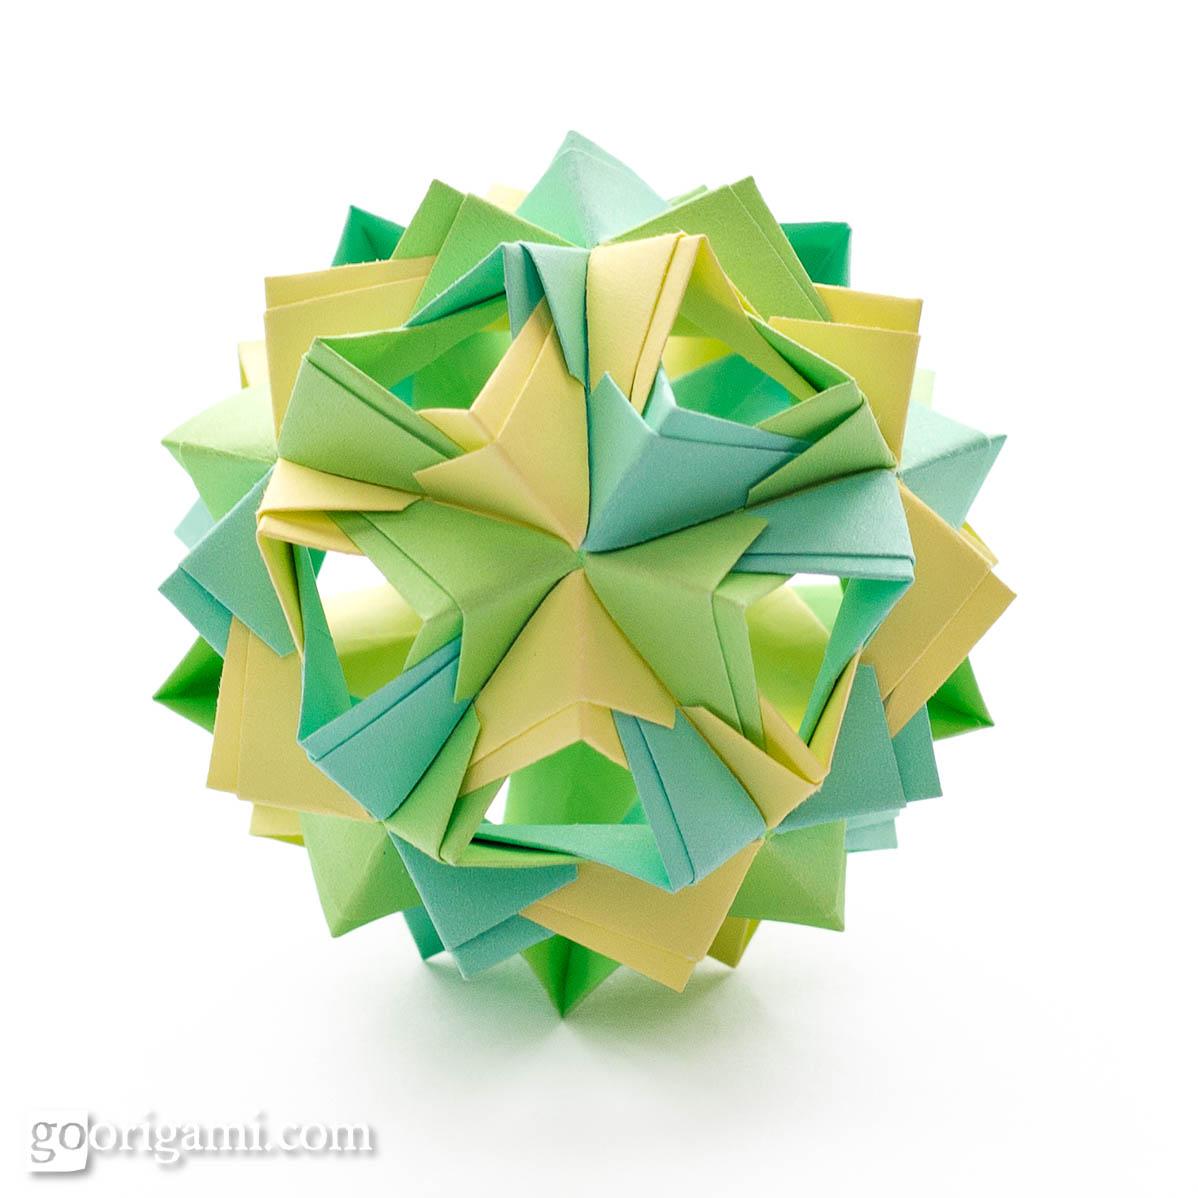 Modular Origami - balls and polyhedra folded by Michał Kosmulski | 1198x1198